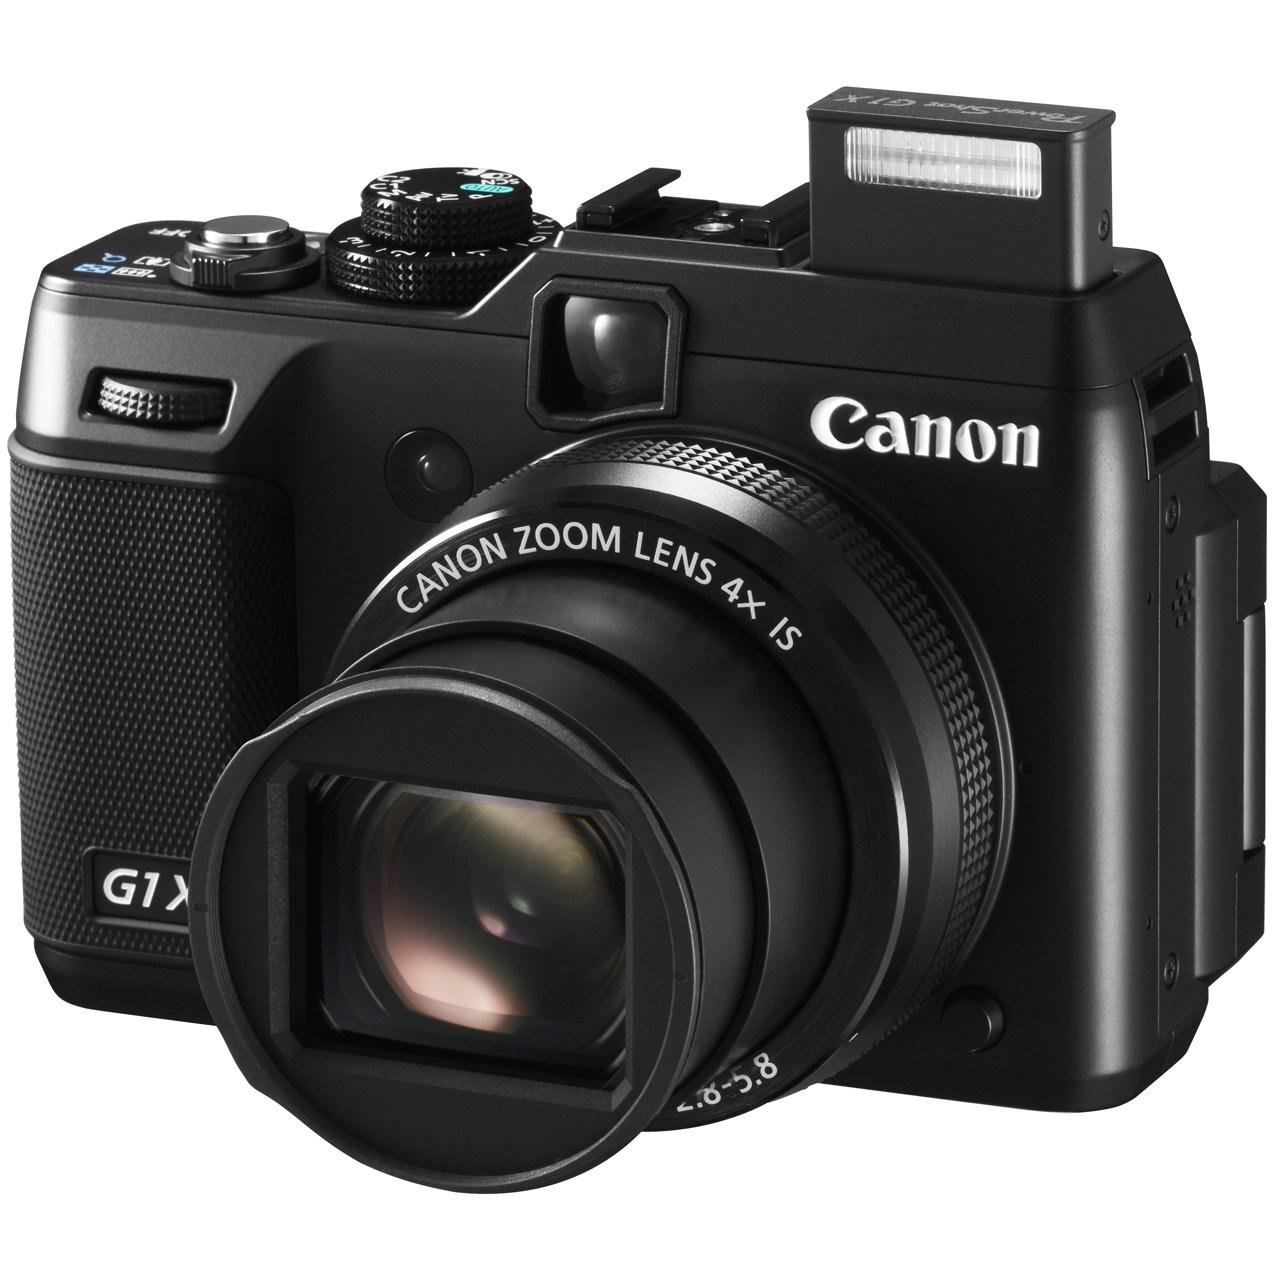 دوربین دیجیتال کانن مدل پاورشات G1X